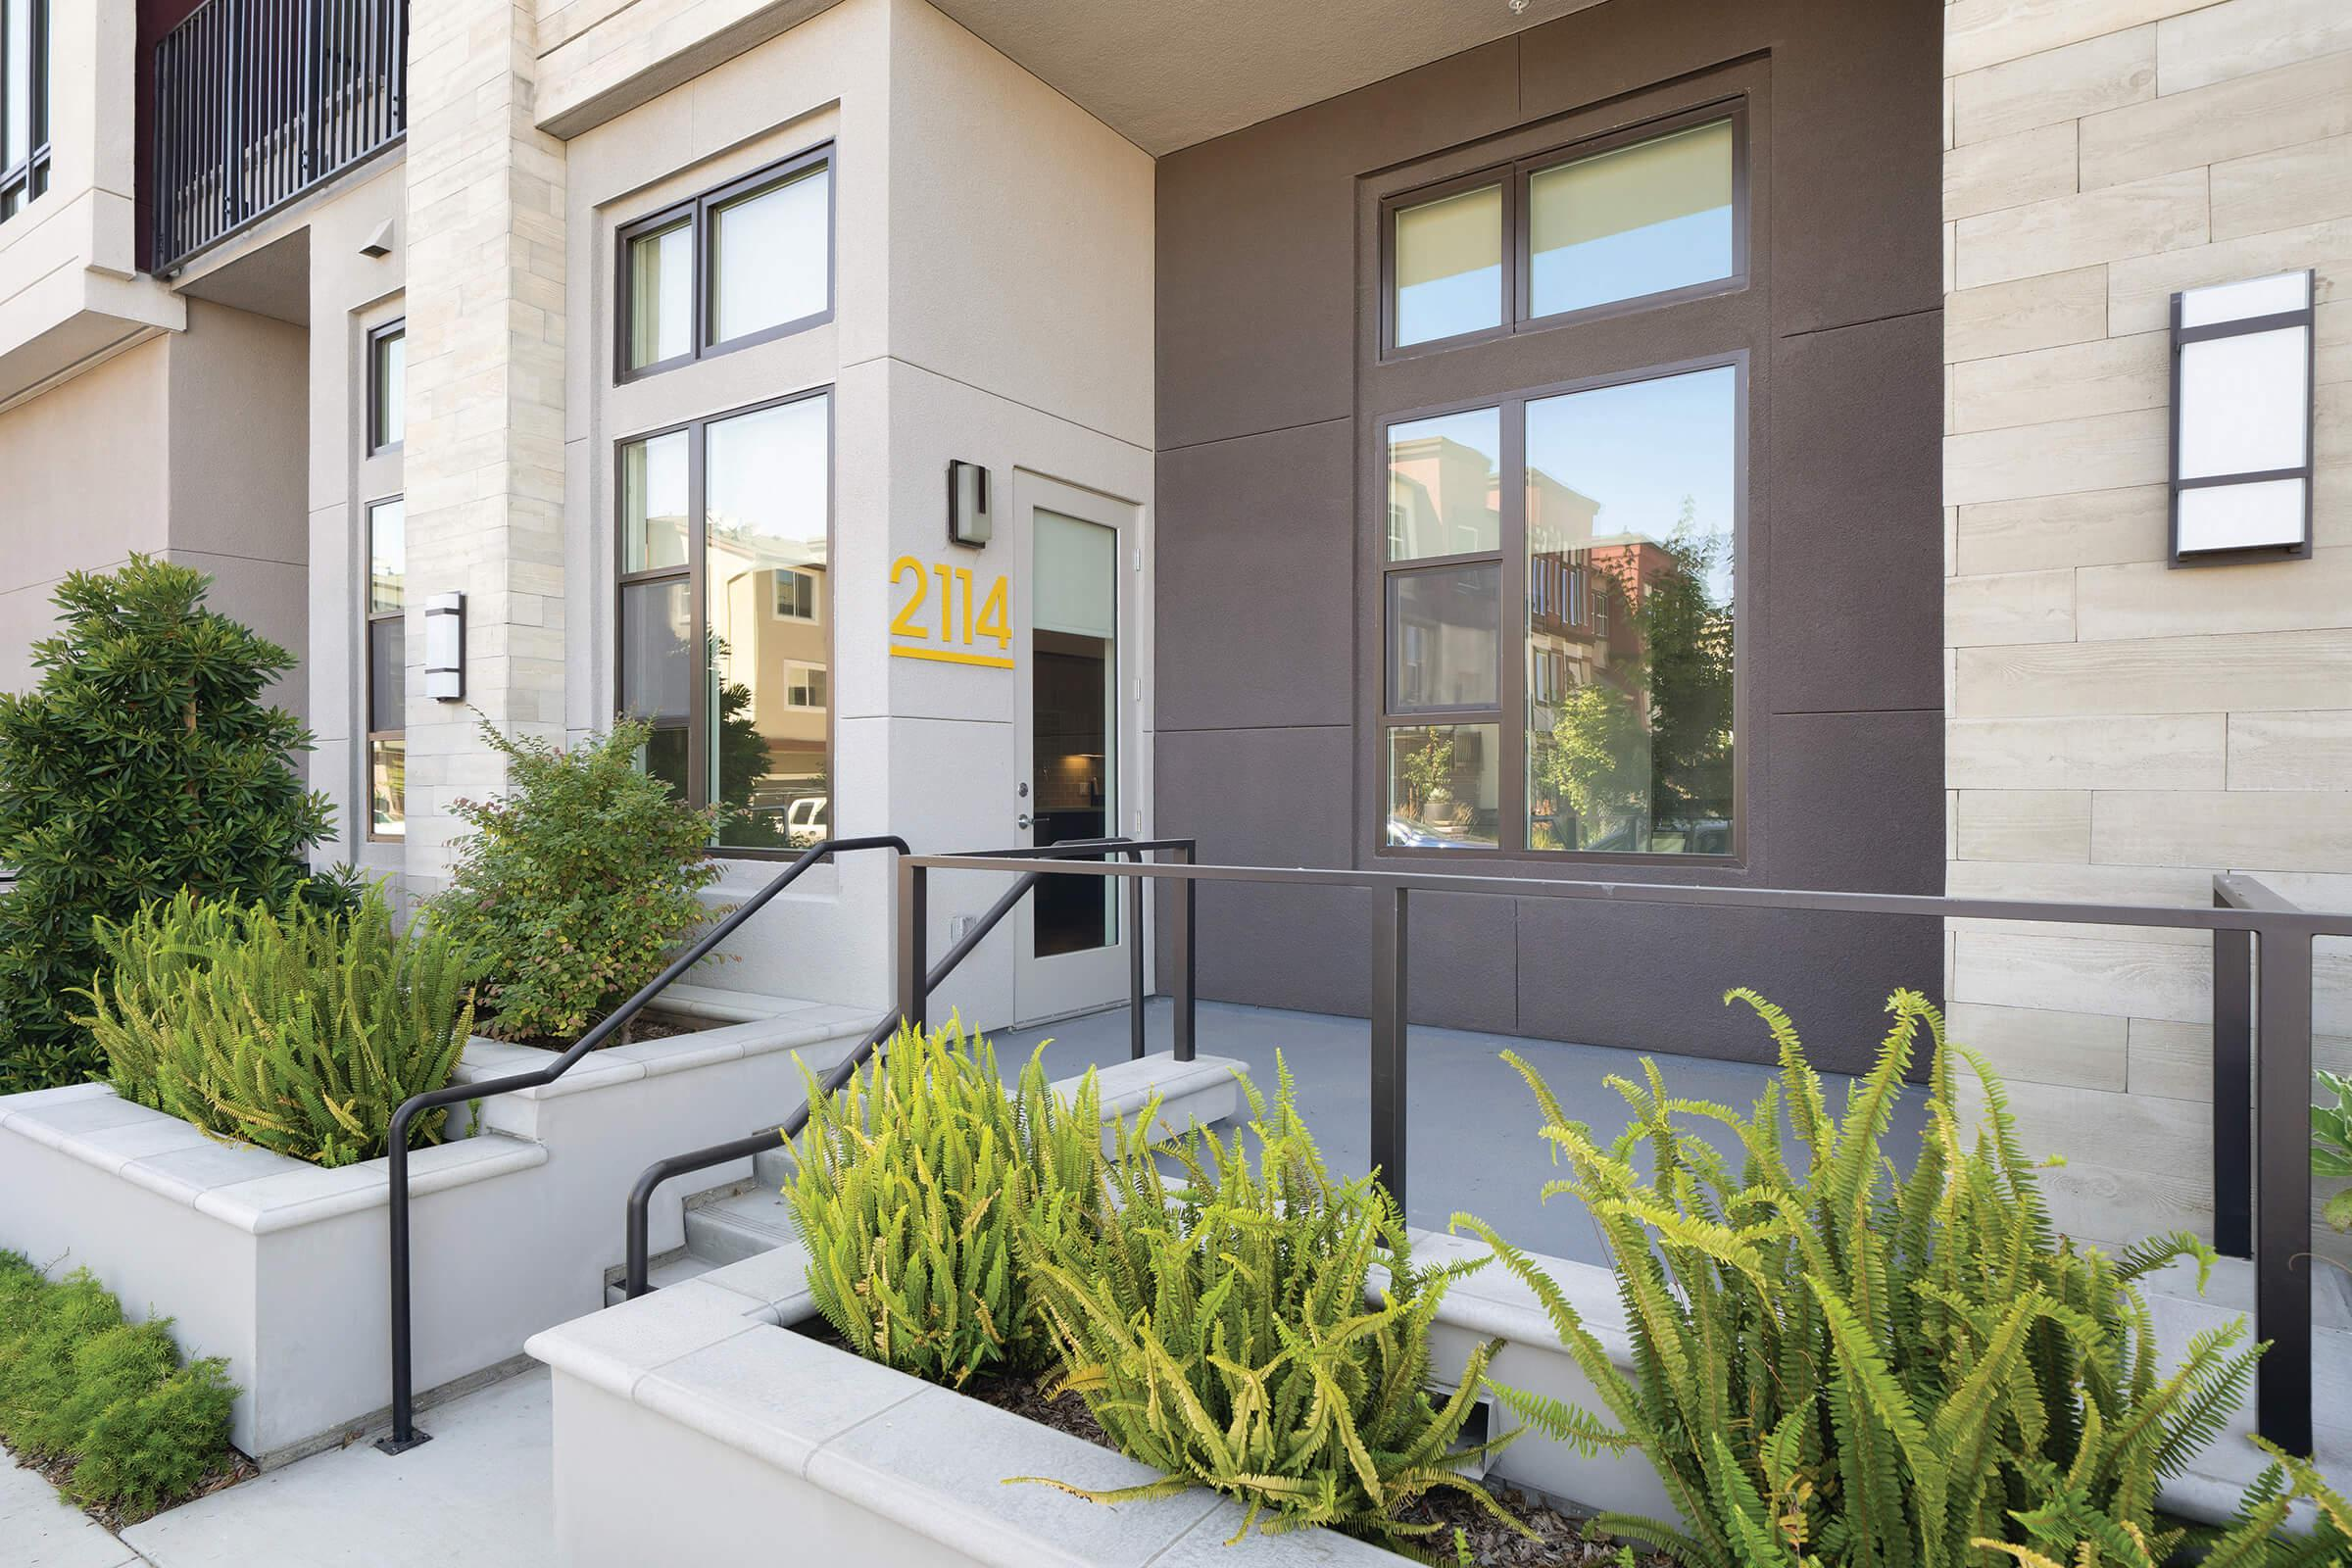 The Platform Urban Apartments entrance